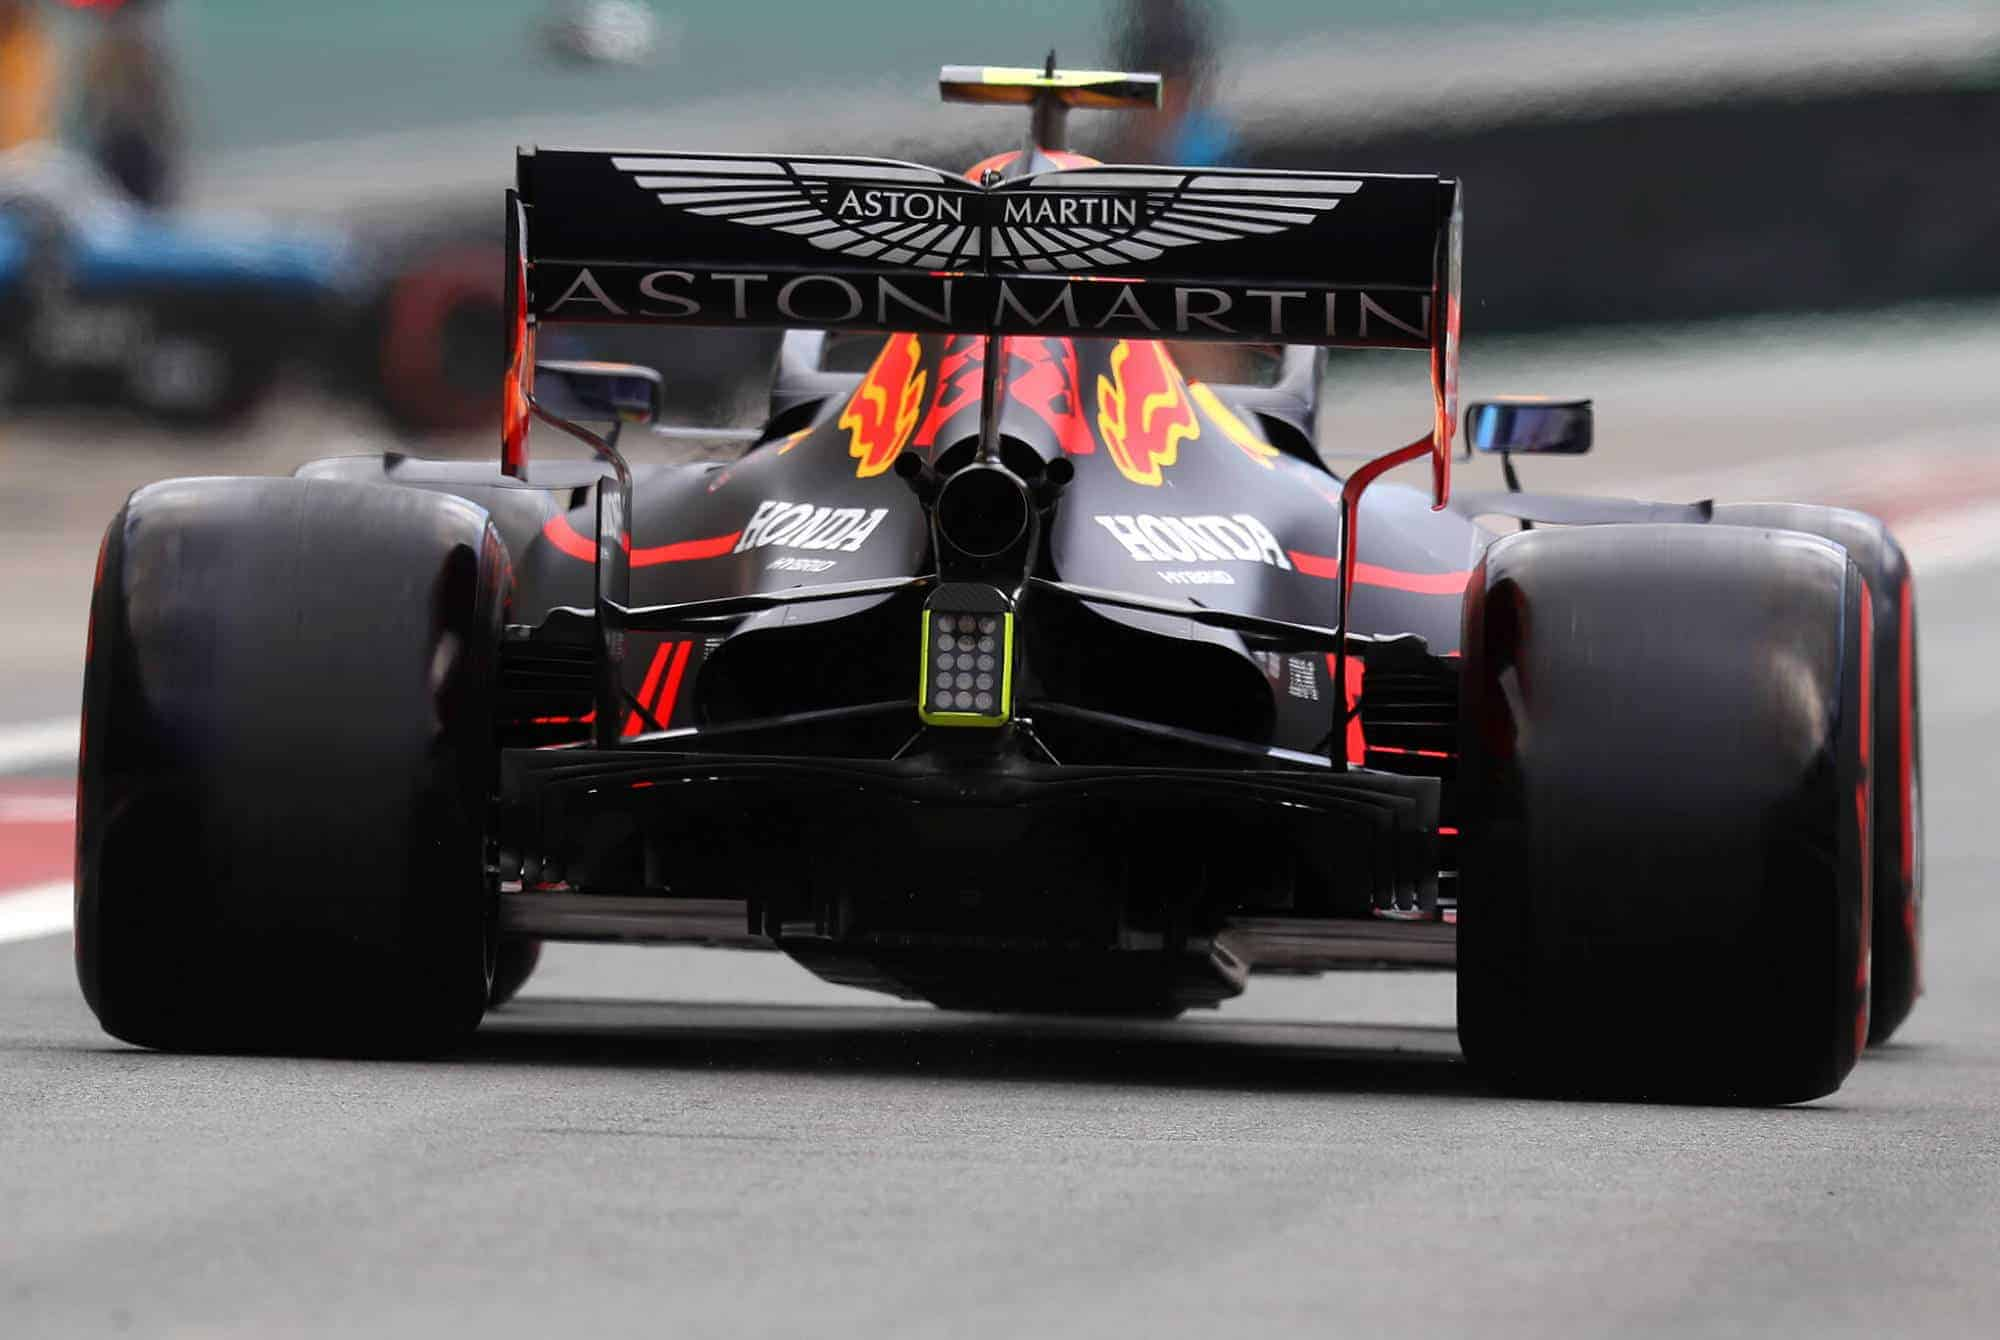 Alexander Albon Red Bull Honda Brazilian GP F1 2019 rear end diffuser Photo Red Bull